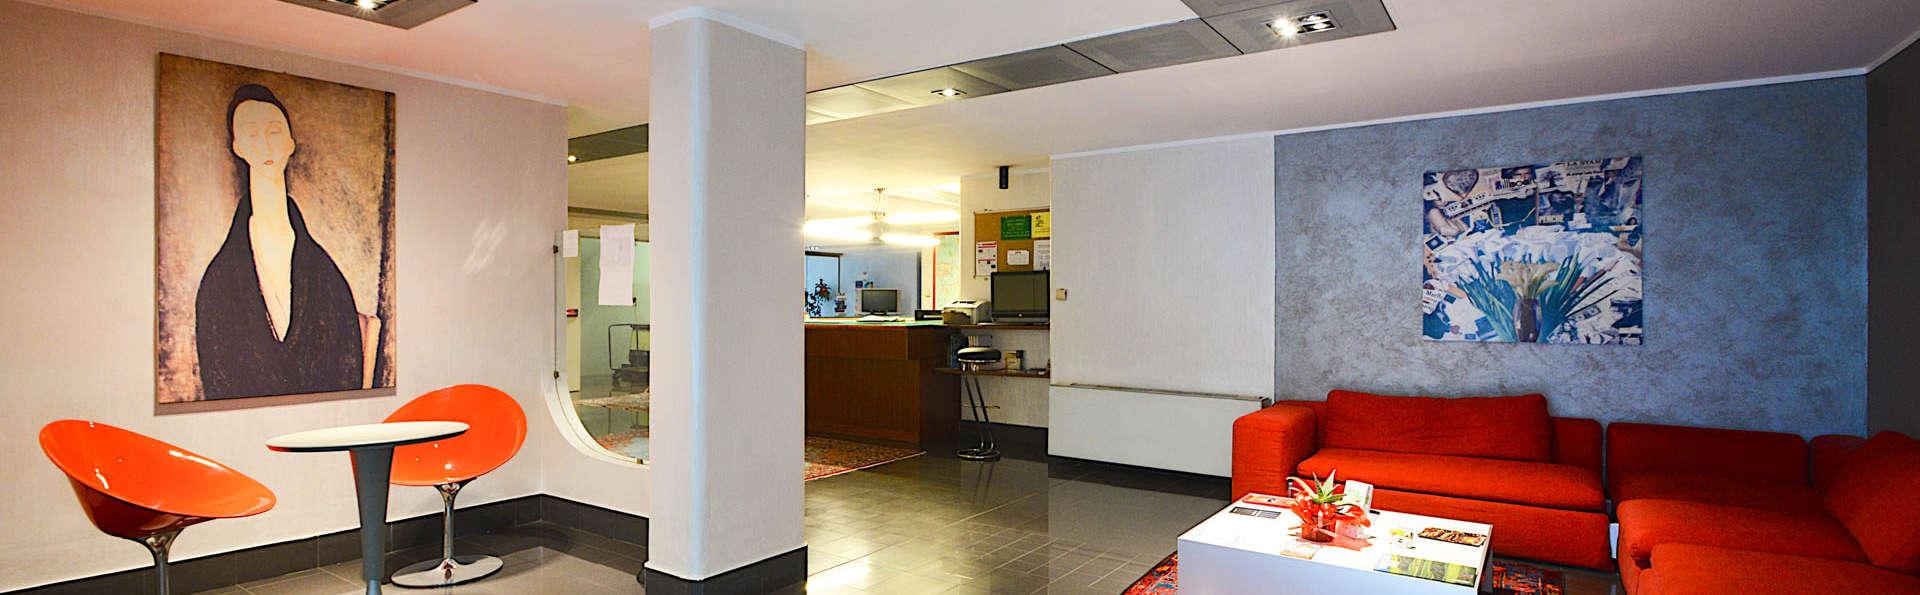 Residence Hotel Torino Uno - EDIT_RECEPTION.jpg